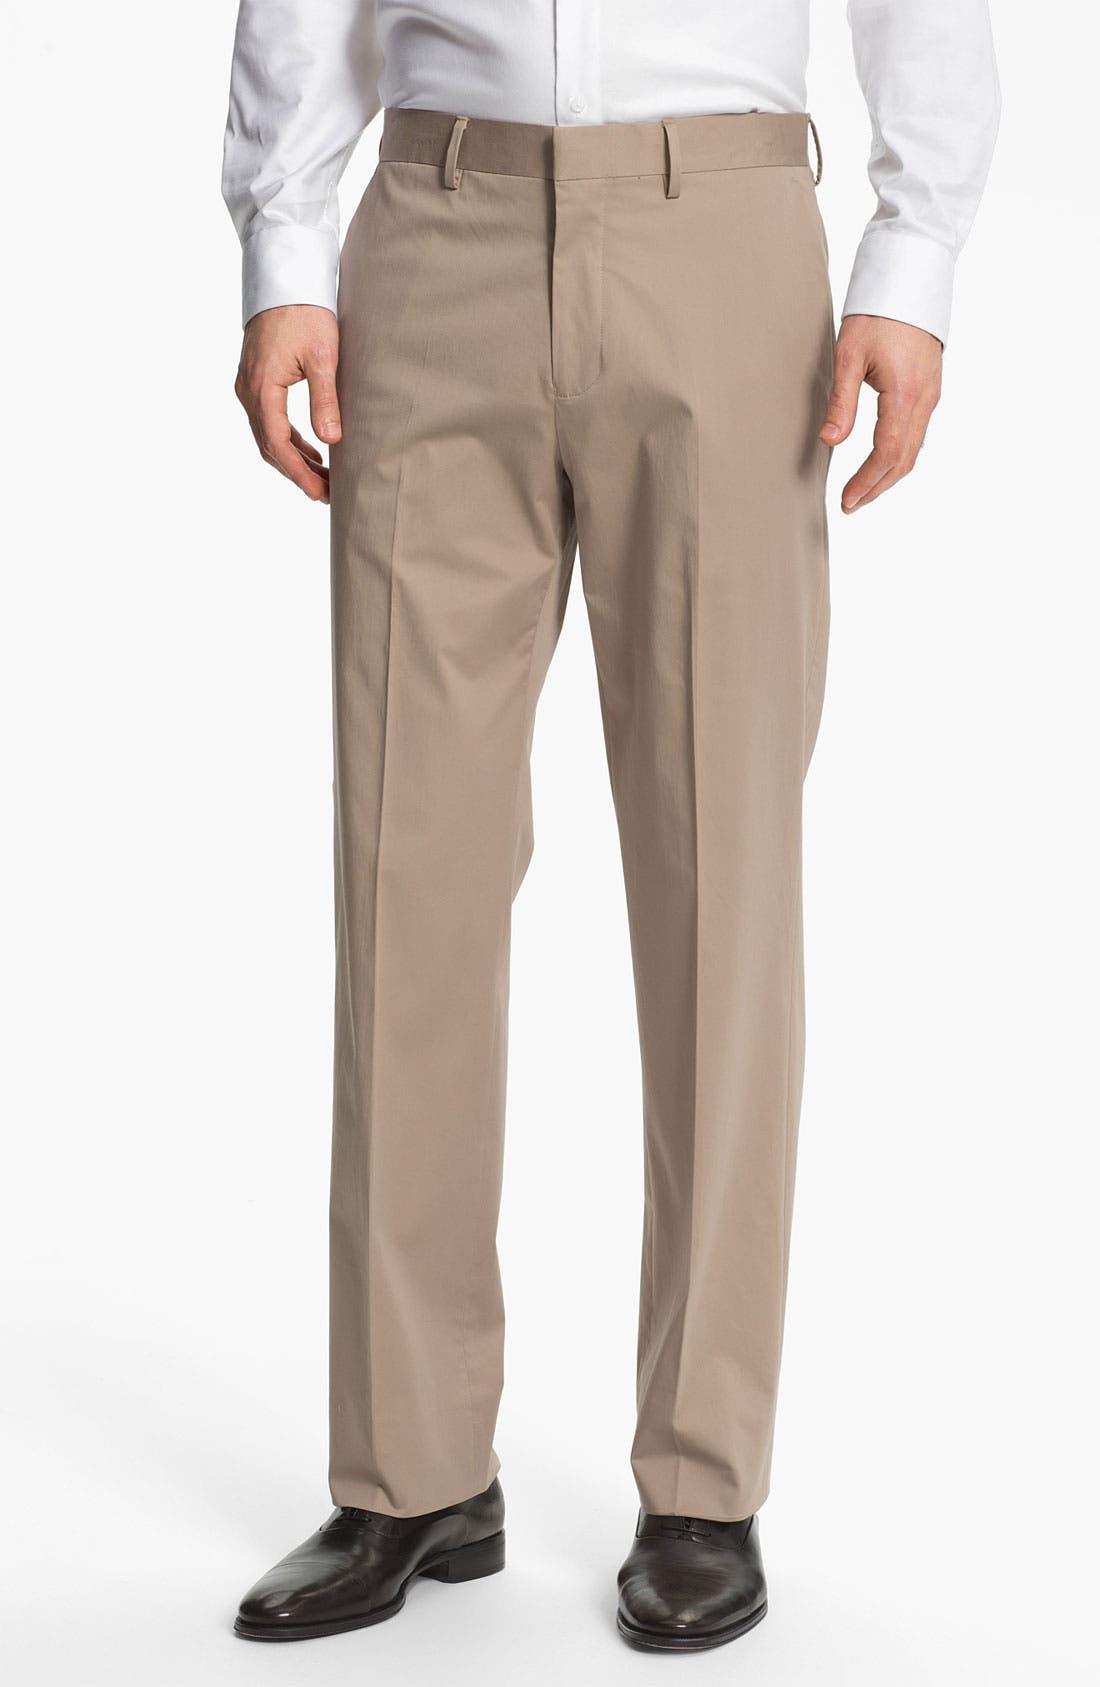 Alternate Image 1 Selected - Michael Kors Flat Front Pants